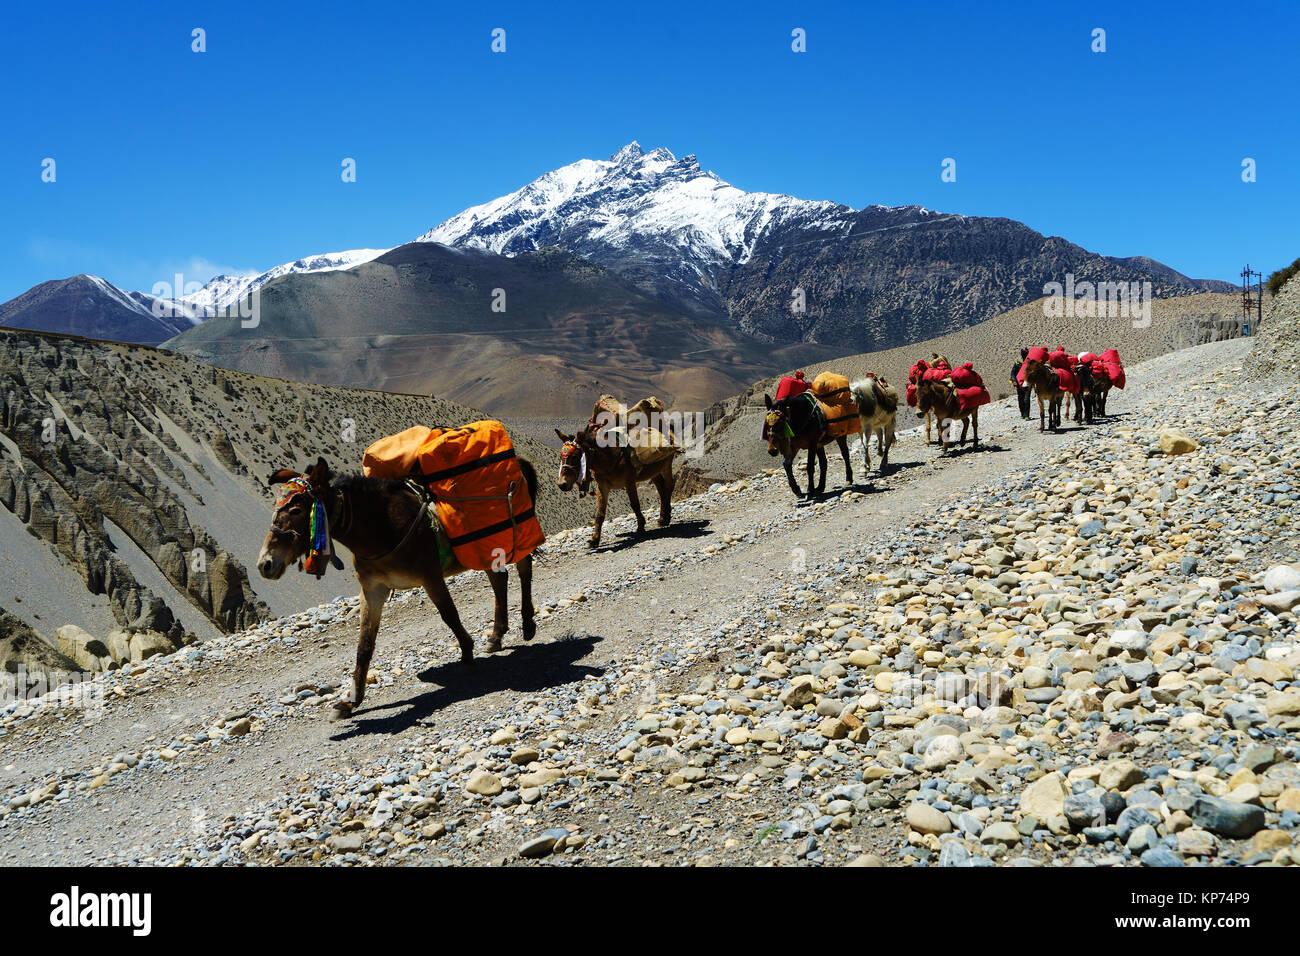 Mule train hauling merchandise between Tangbe and Chuksang, Upper Mustang region, Nepal. - Stock Image